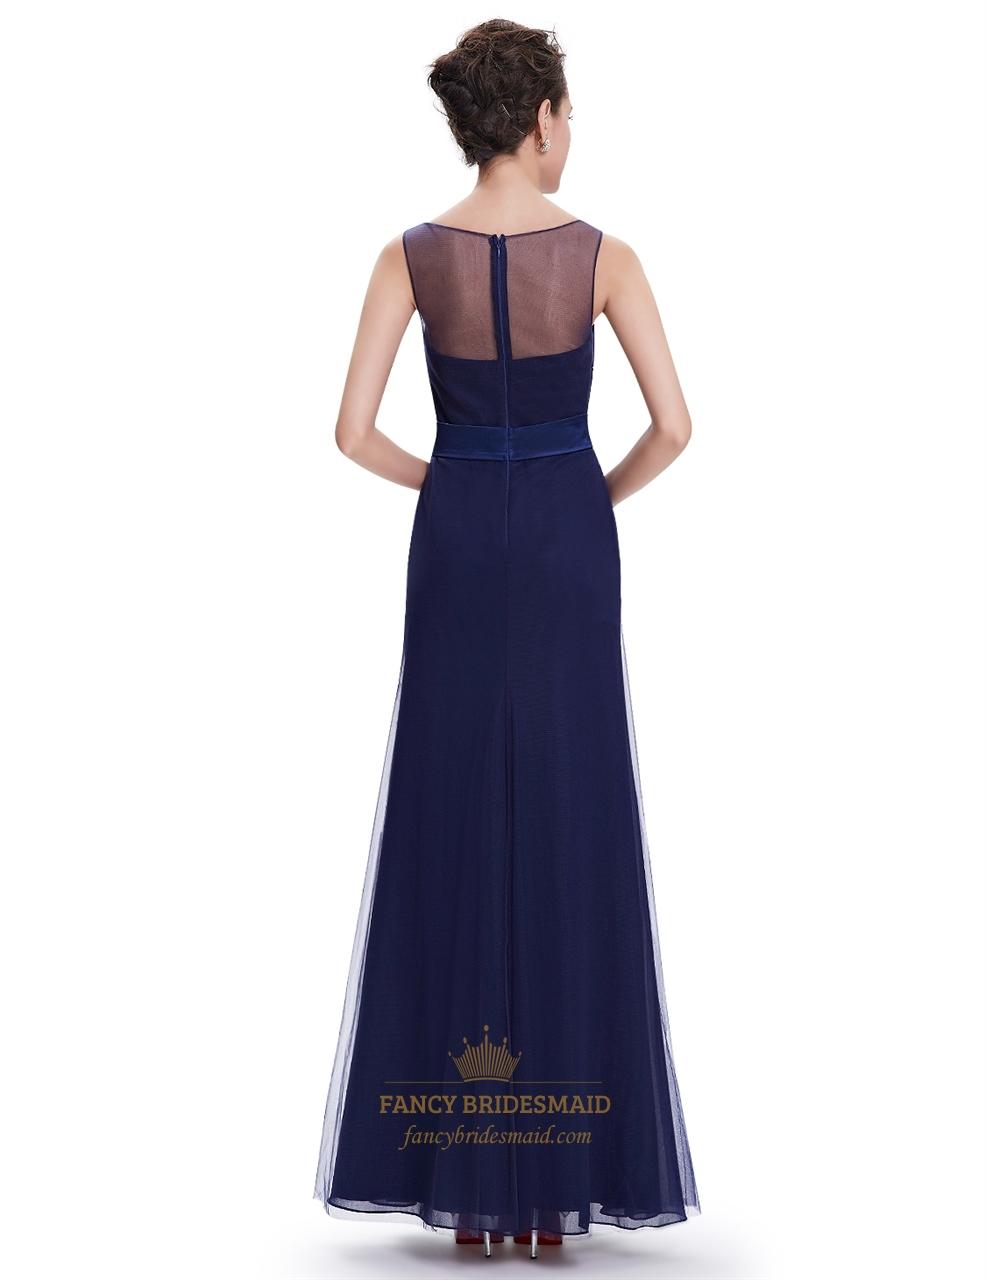 Navy Blue Sheath Floor Length Tulle Prom Dress With Beaded ...